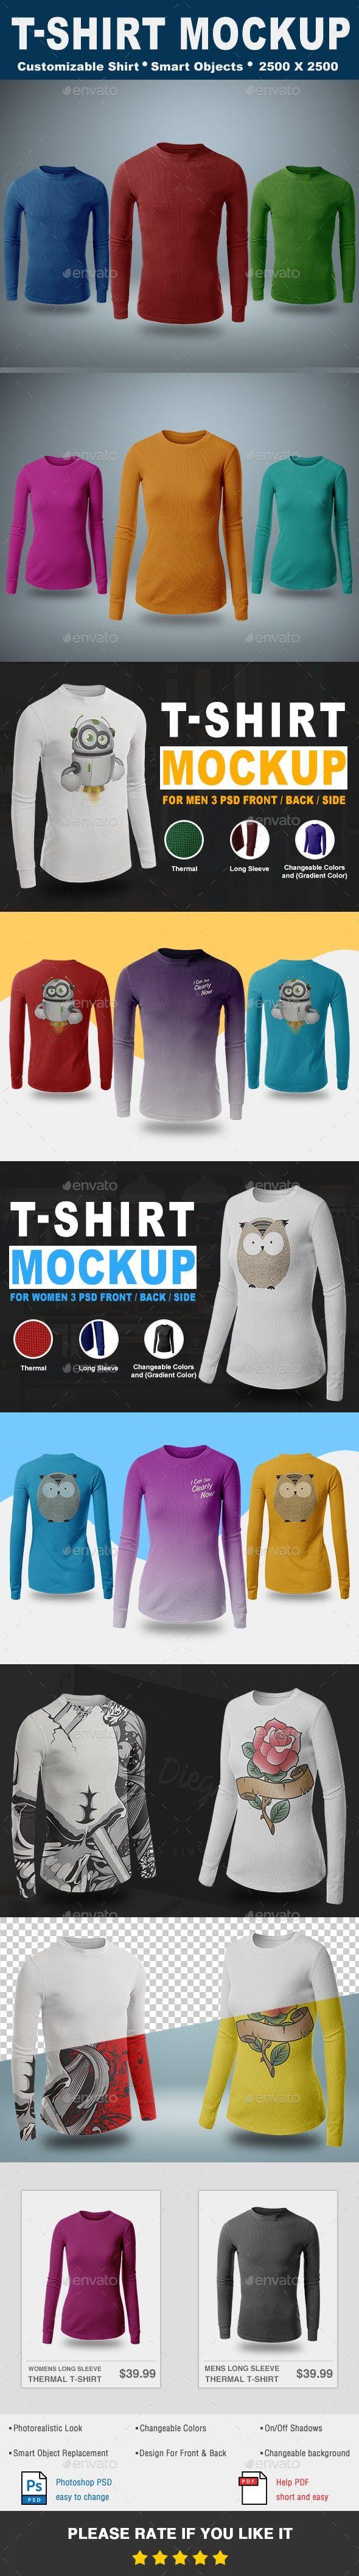 Download Thermal T Shirt Mockup Vol 2